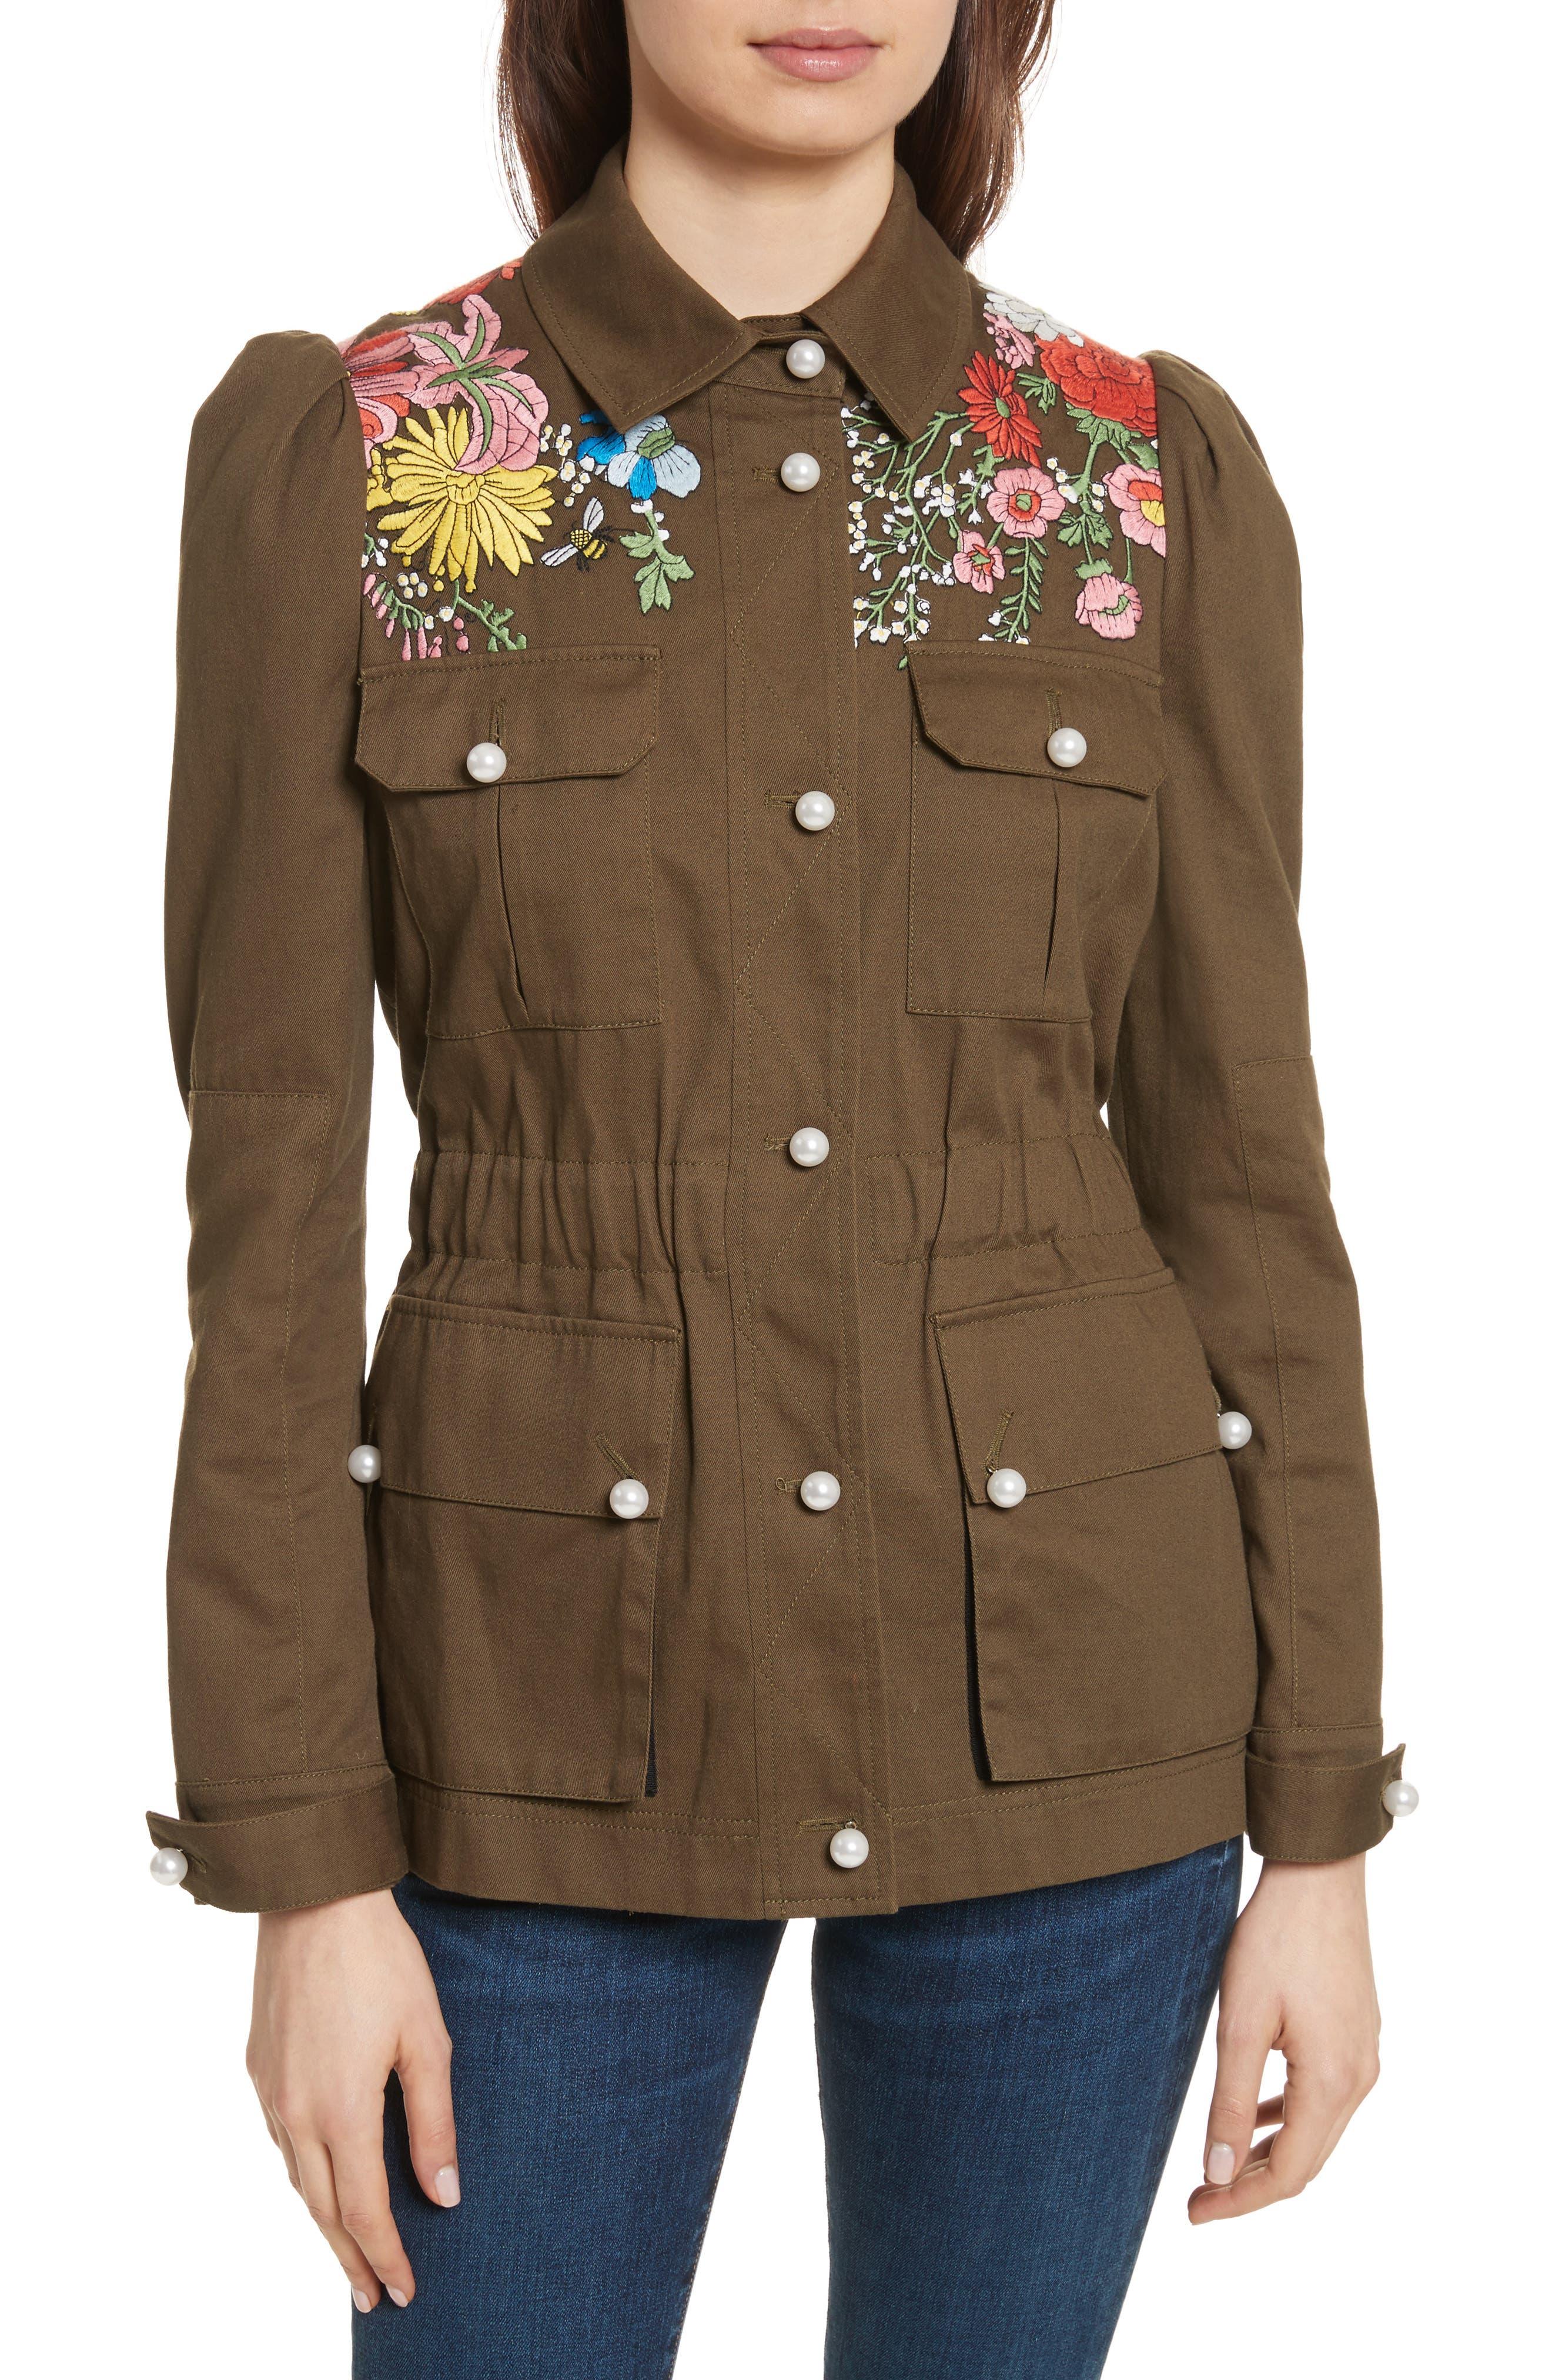 Huxley Floral Embroidered Safari Jacket,                         Main,                         color, 310